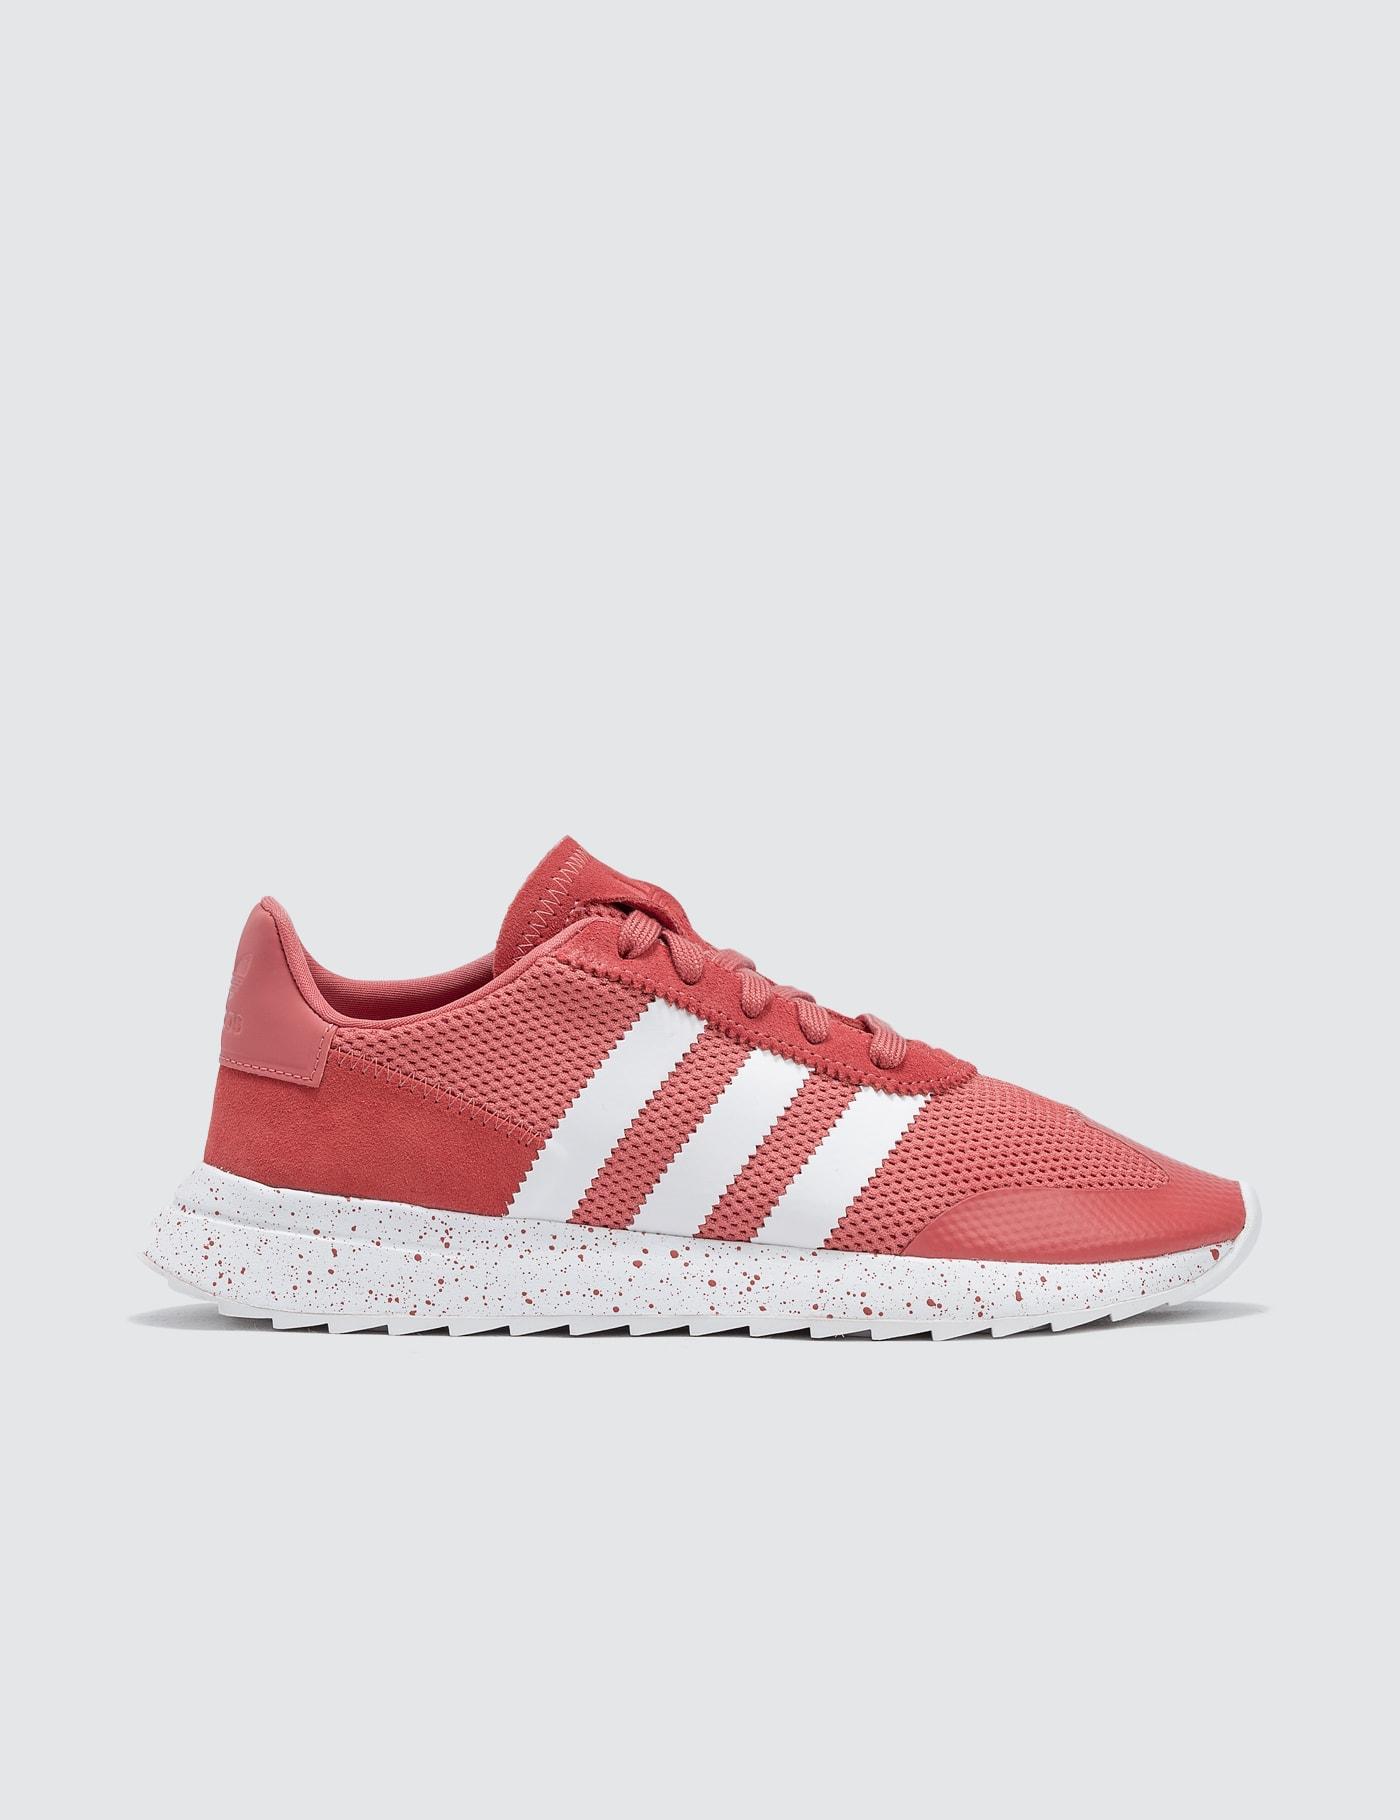 Adidas Originals Flb Runner W